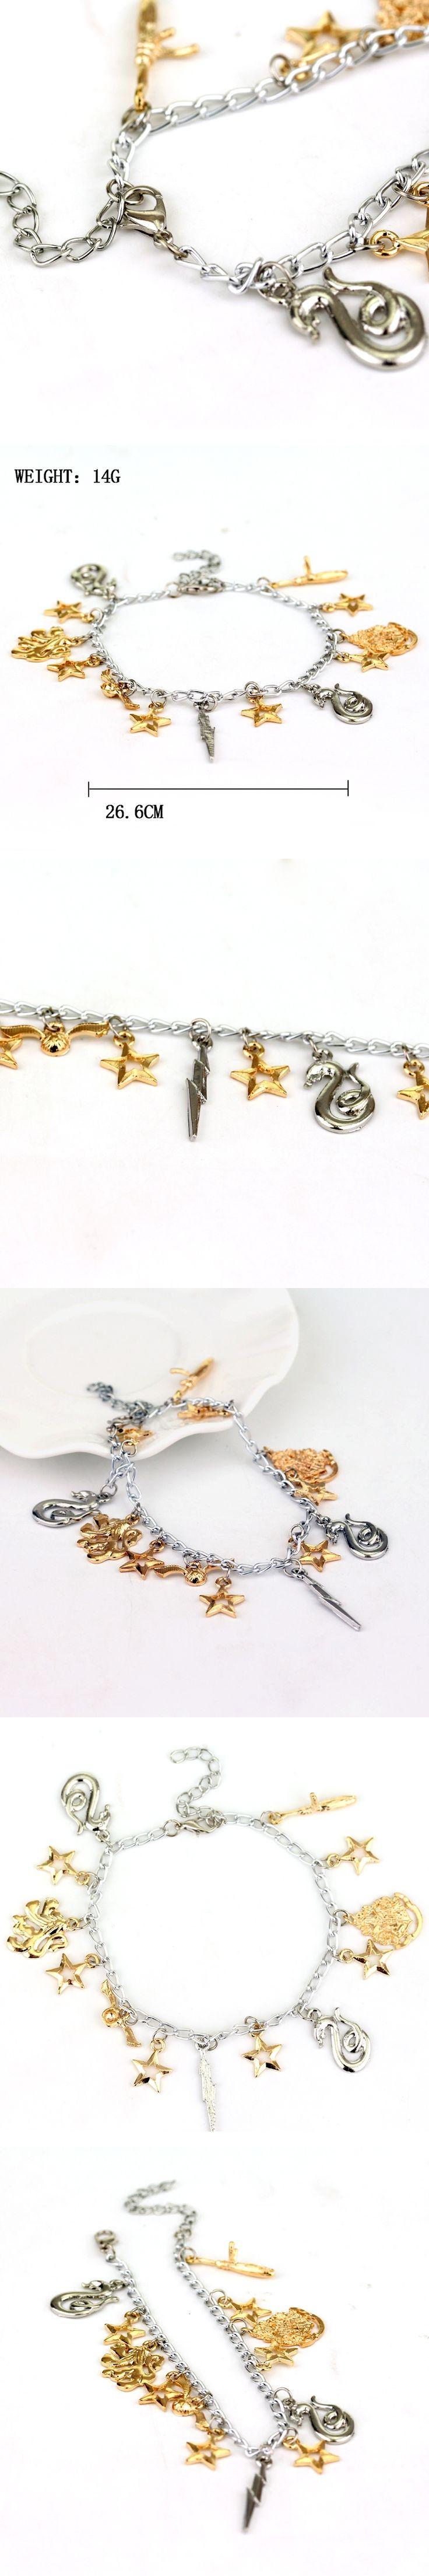 Slytherin Snitch Bracelet for Women and Men, Gryffindor school badge Jewelry Charm bracelet for men hamsa hand pulseras Bangles